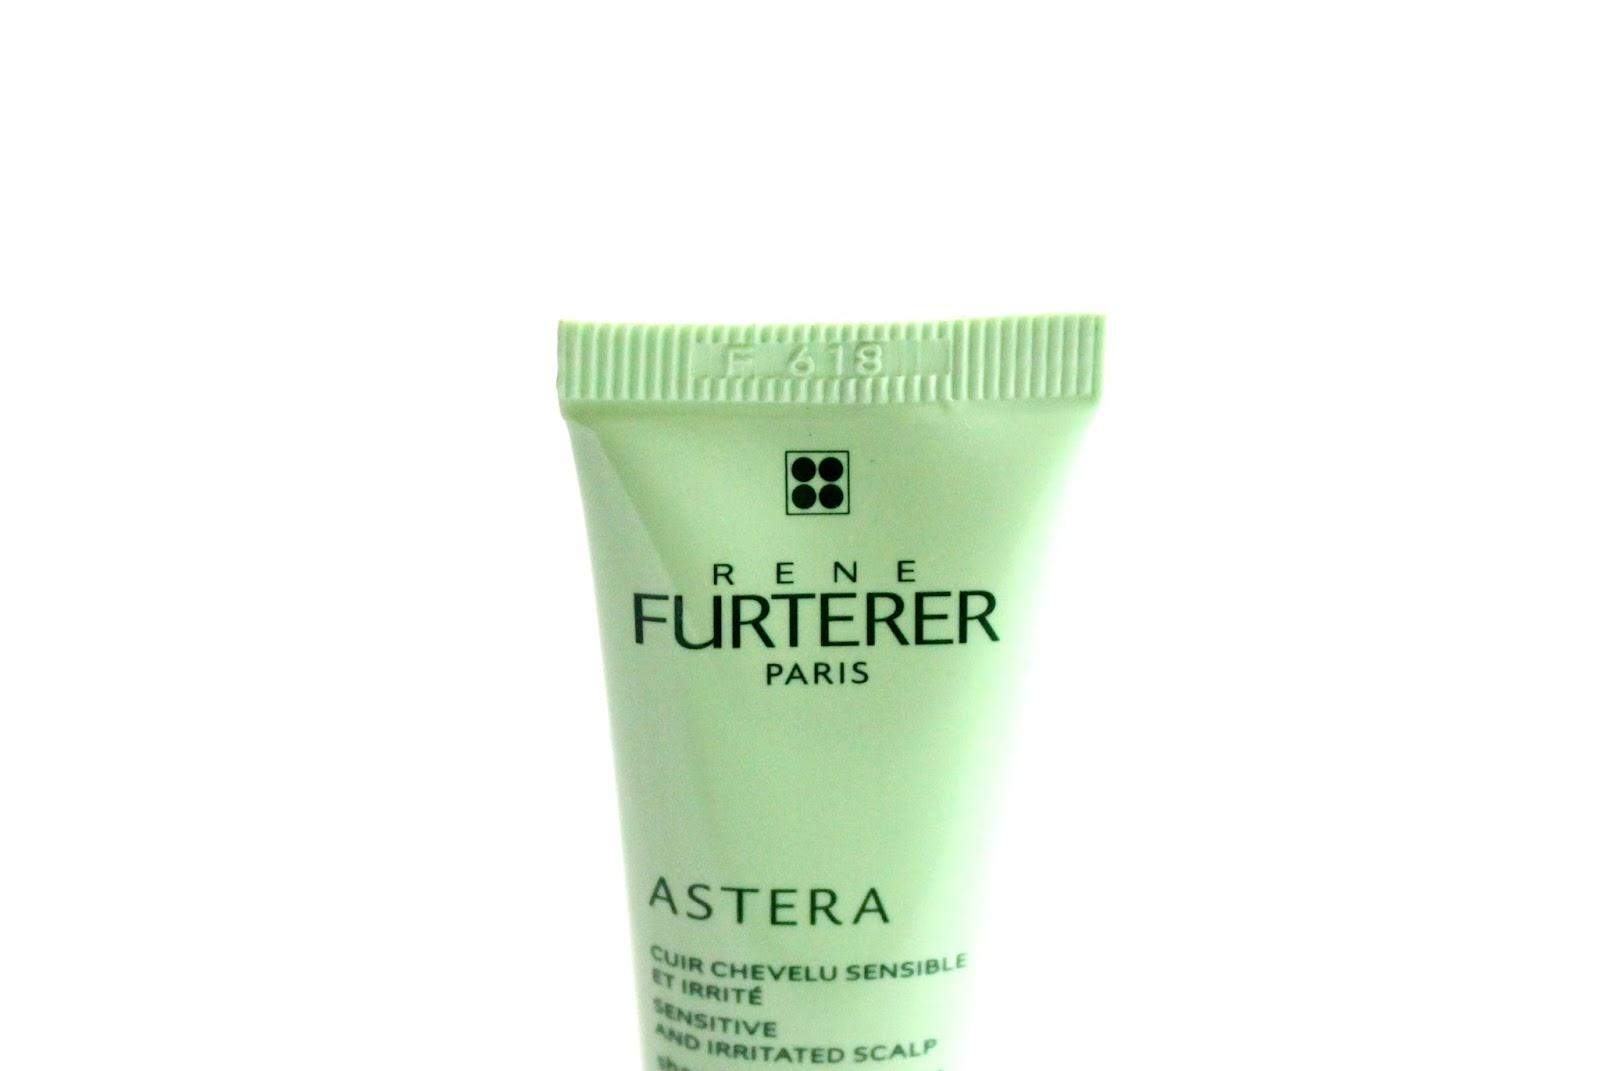 Rene Furterer Astera Shampoo review, photos, price, buy online india